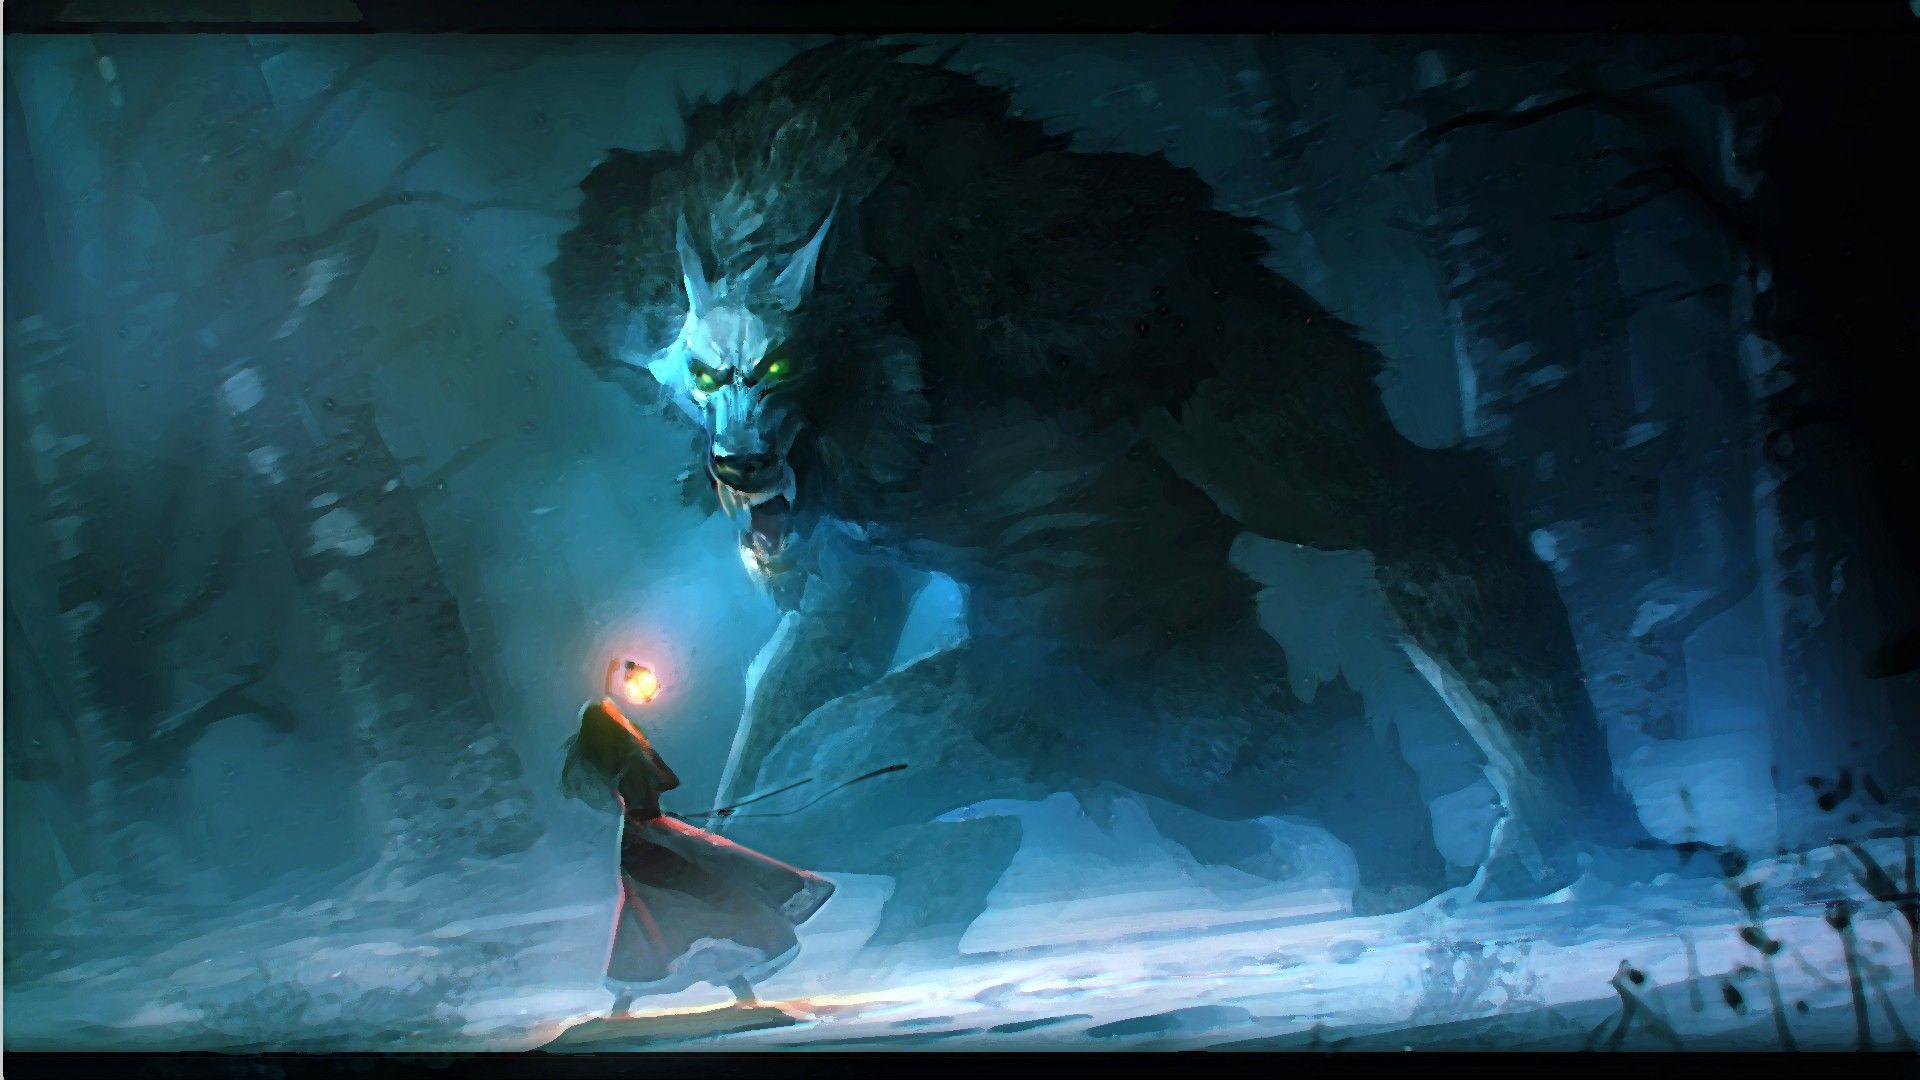 Animals Wolf Monster Anime Wallpaper Hd Wallpaper Wallshed